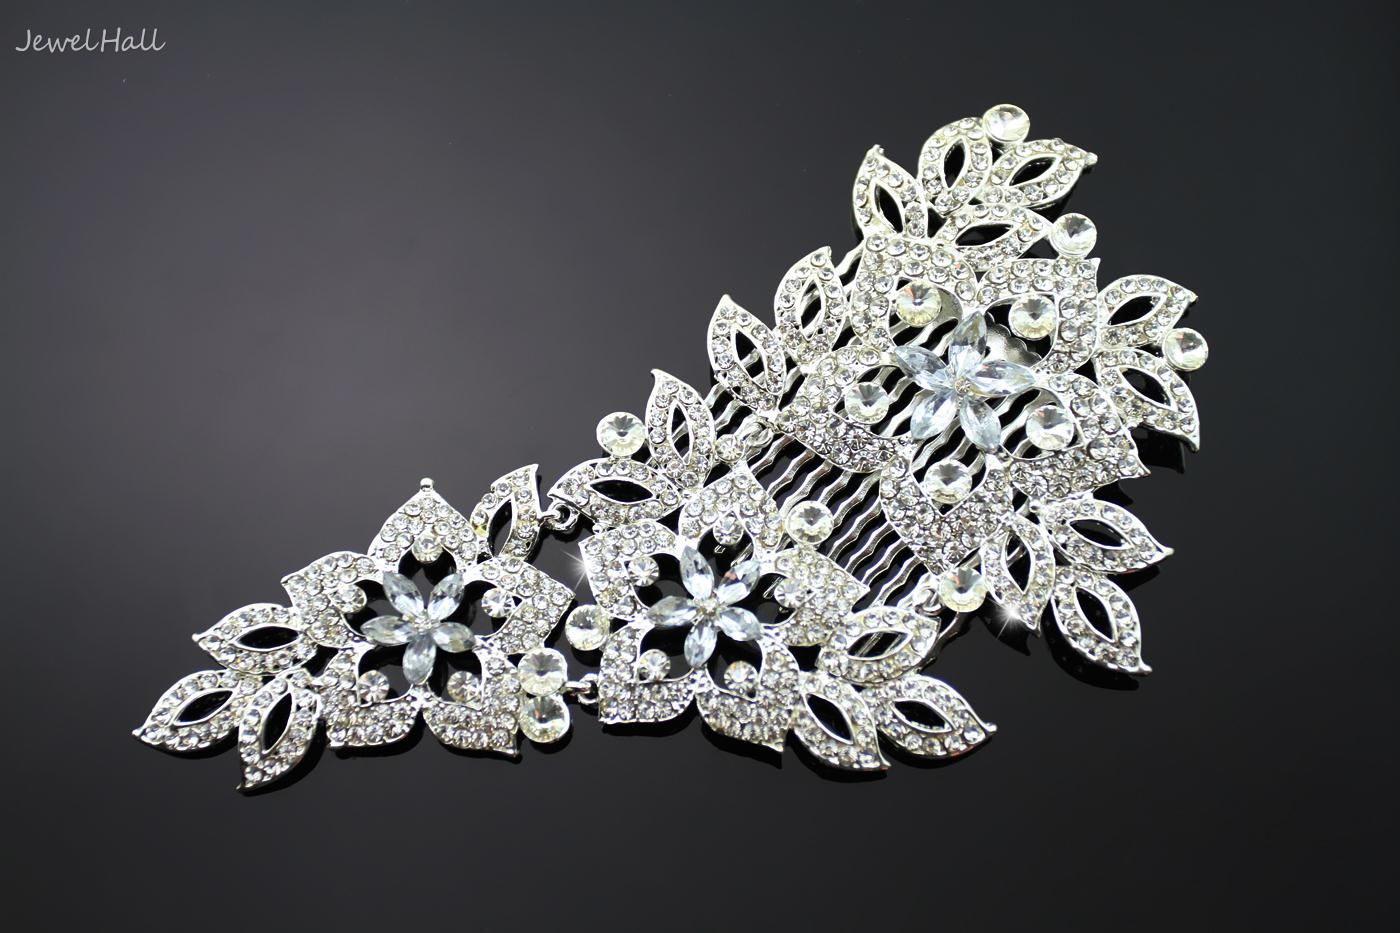 Unique Attractive Alloy with Rhinestone Wedding Bridal Tiara: jewelhall.com